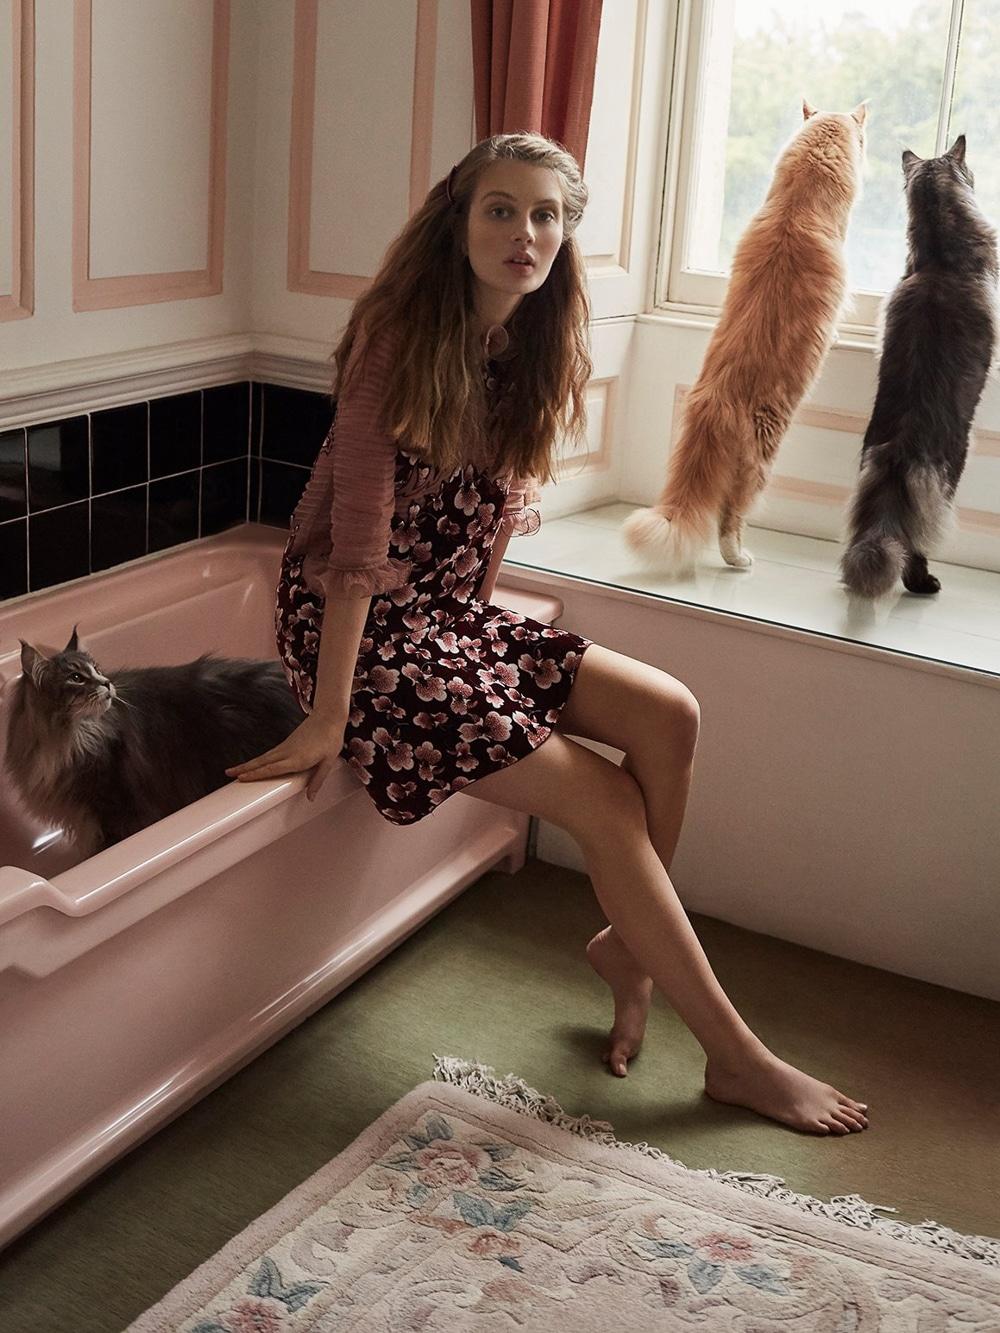 Harpers-Bazaar-UK-Septamber-2018-Florence-Kosky-Agata-Pospieszynska-8.jpg